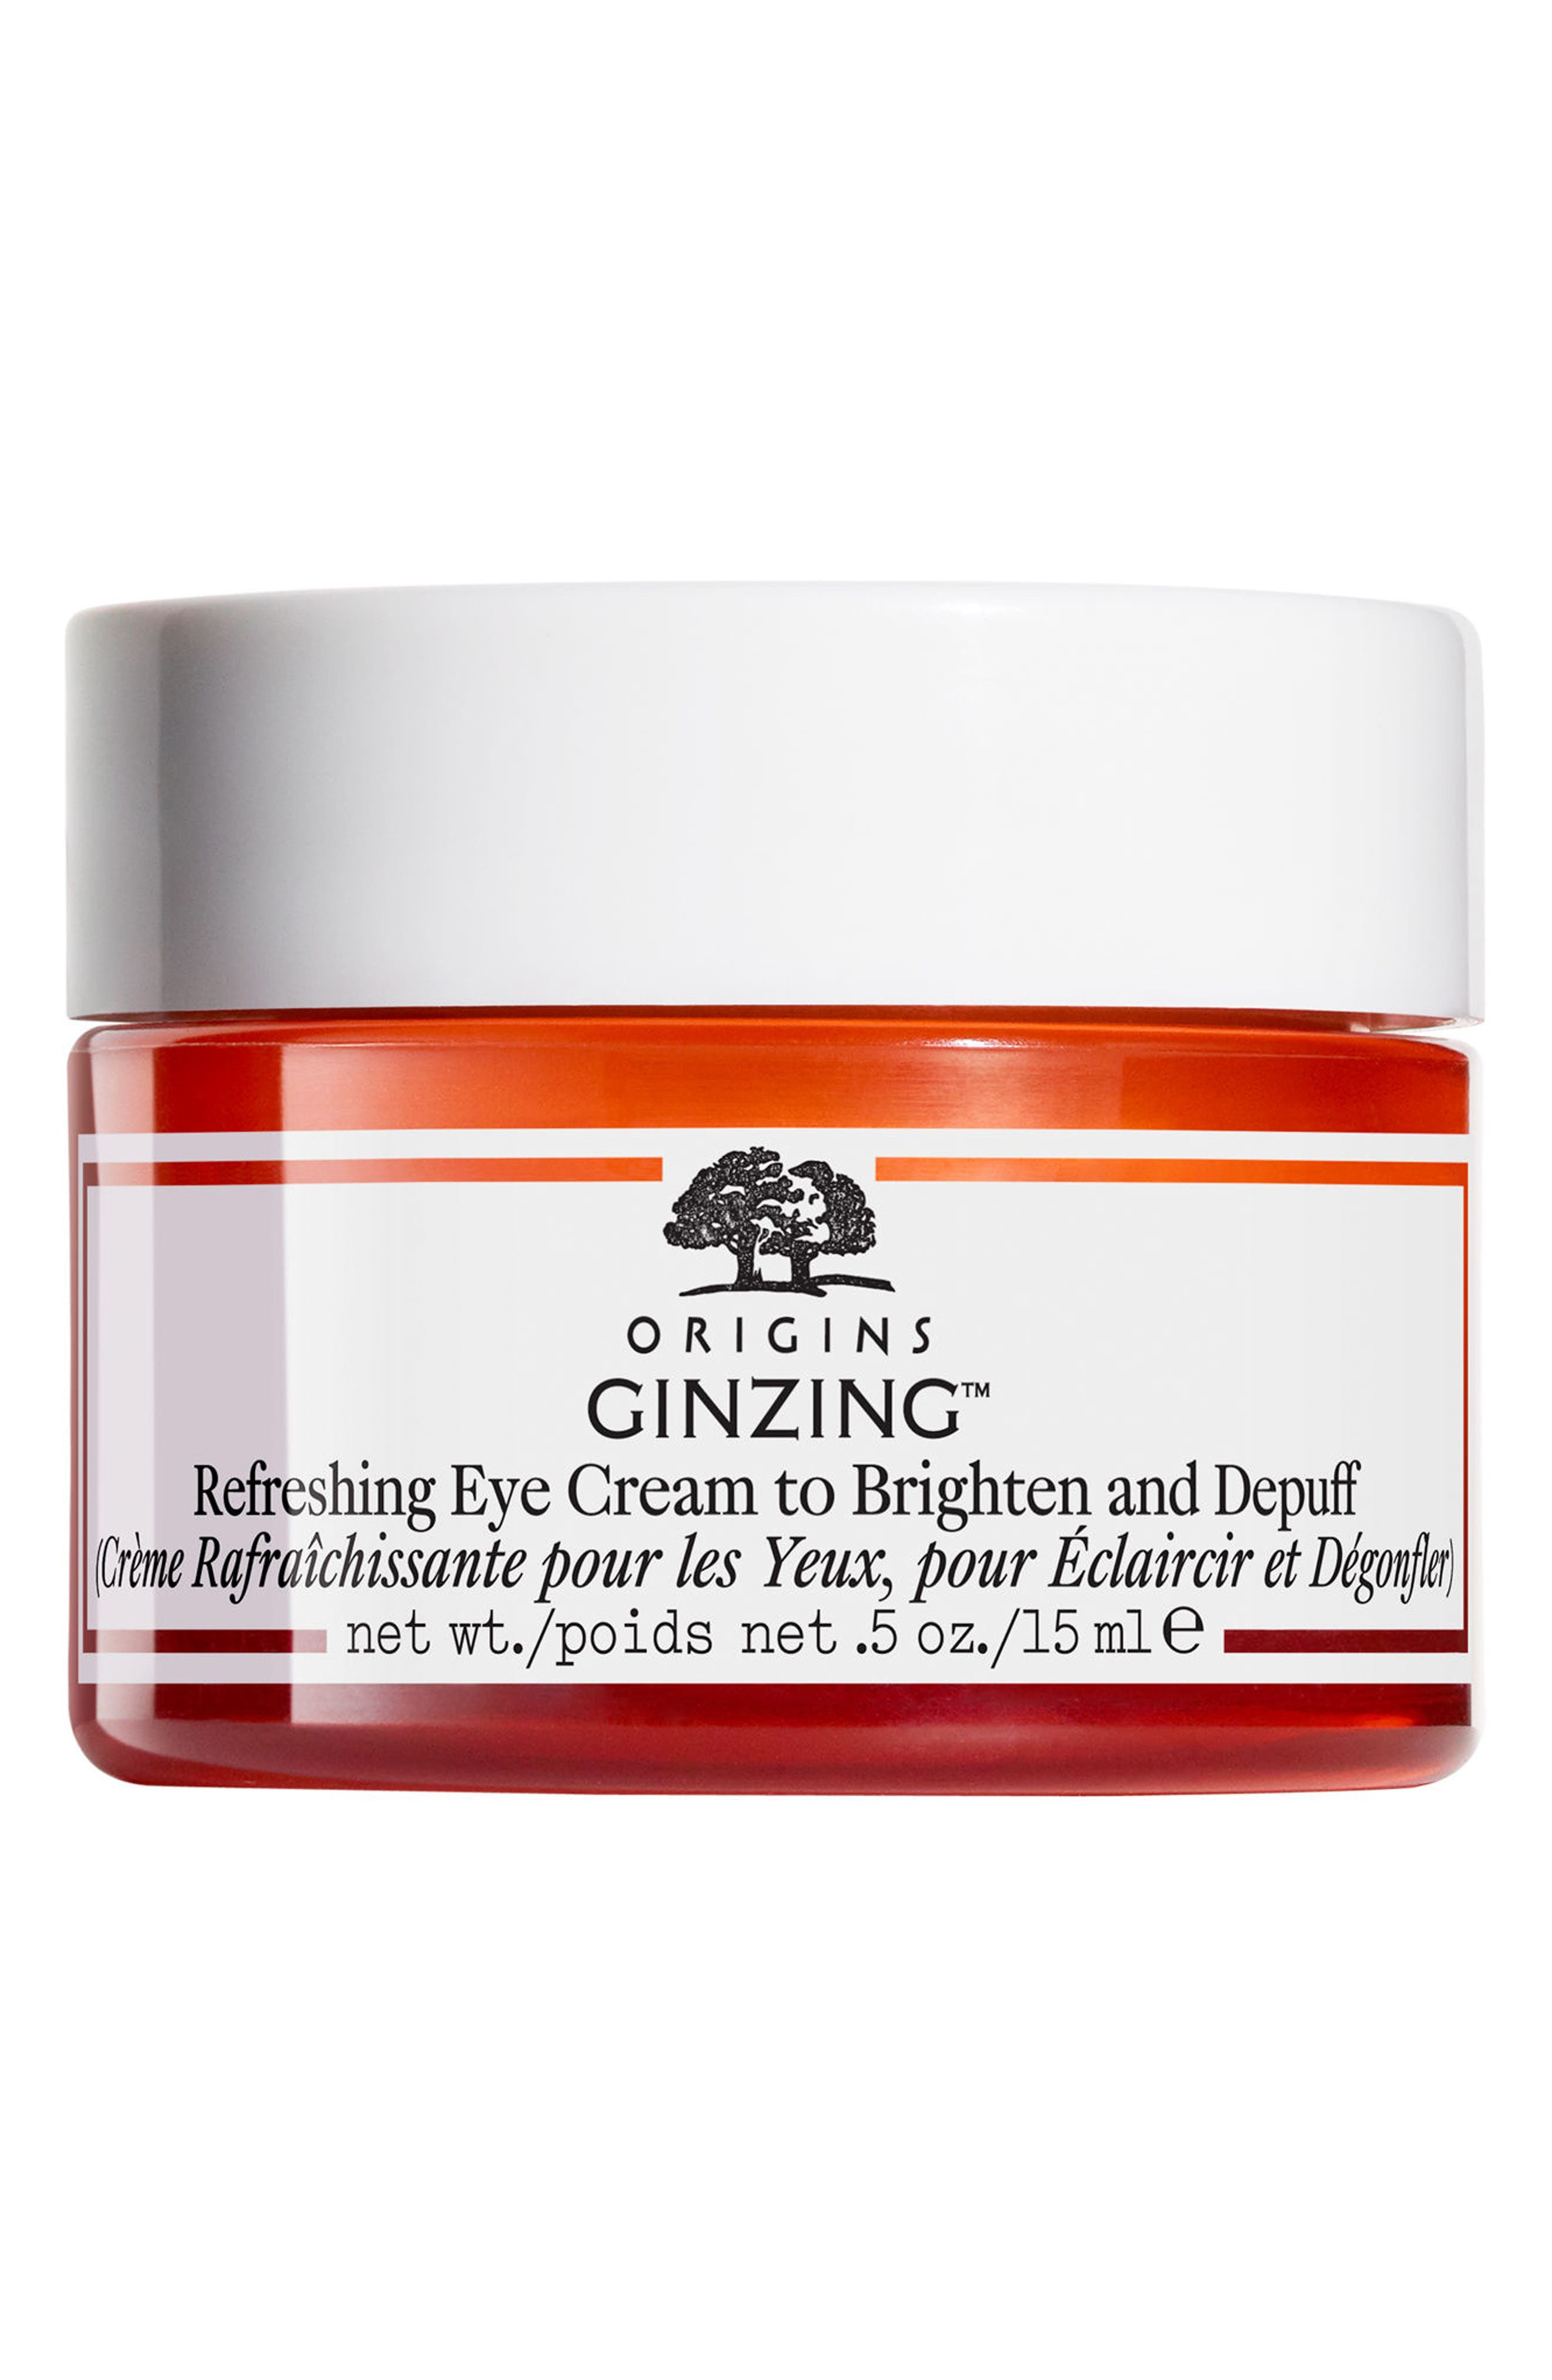 Origins GinZing™ Refreshing Eye Cream to Brighten & Depuff